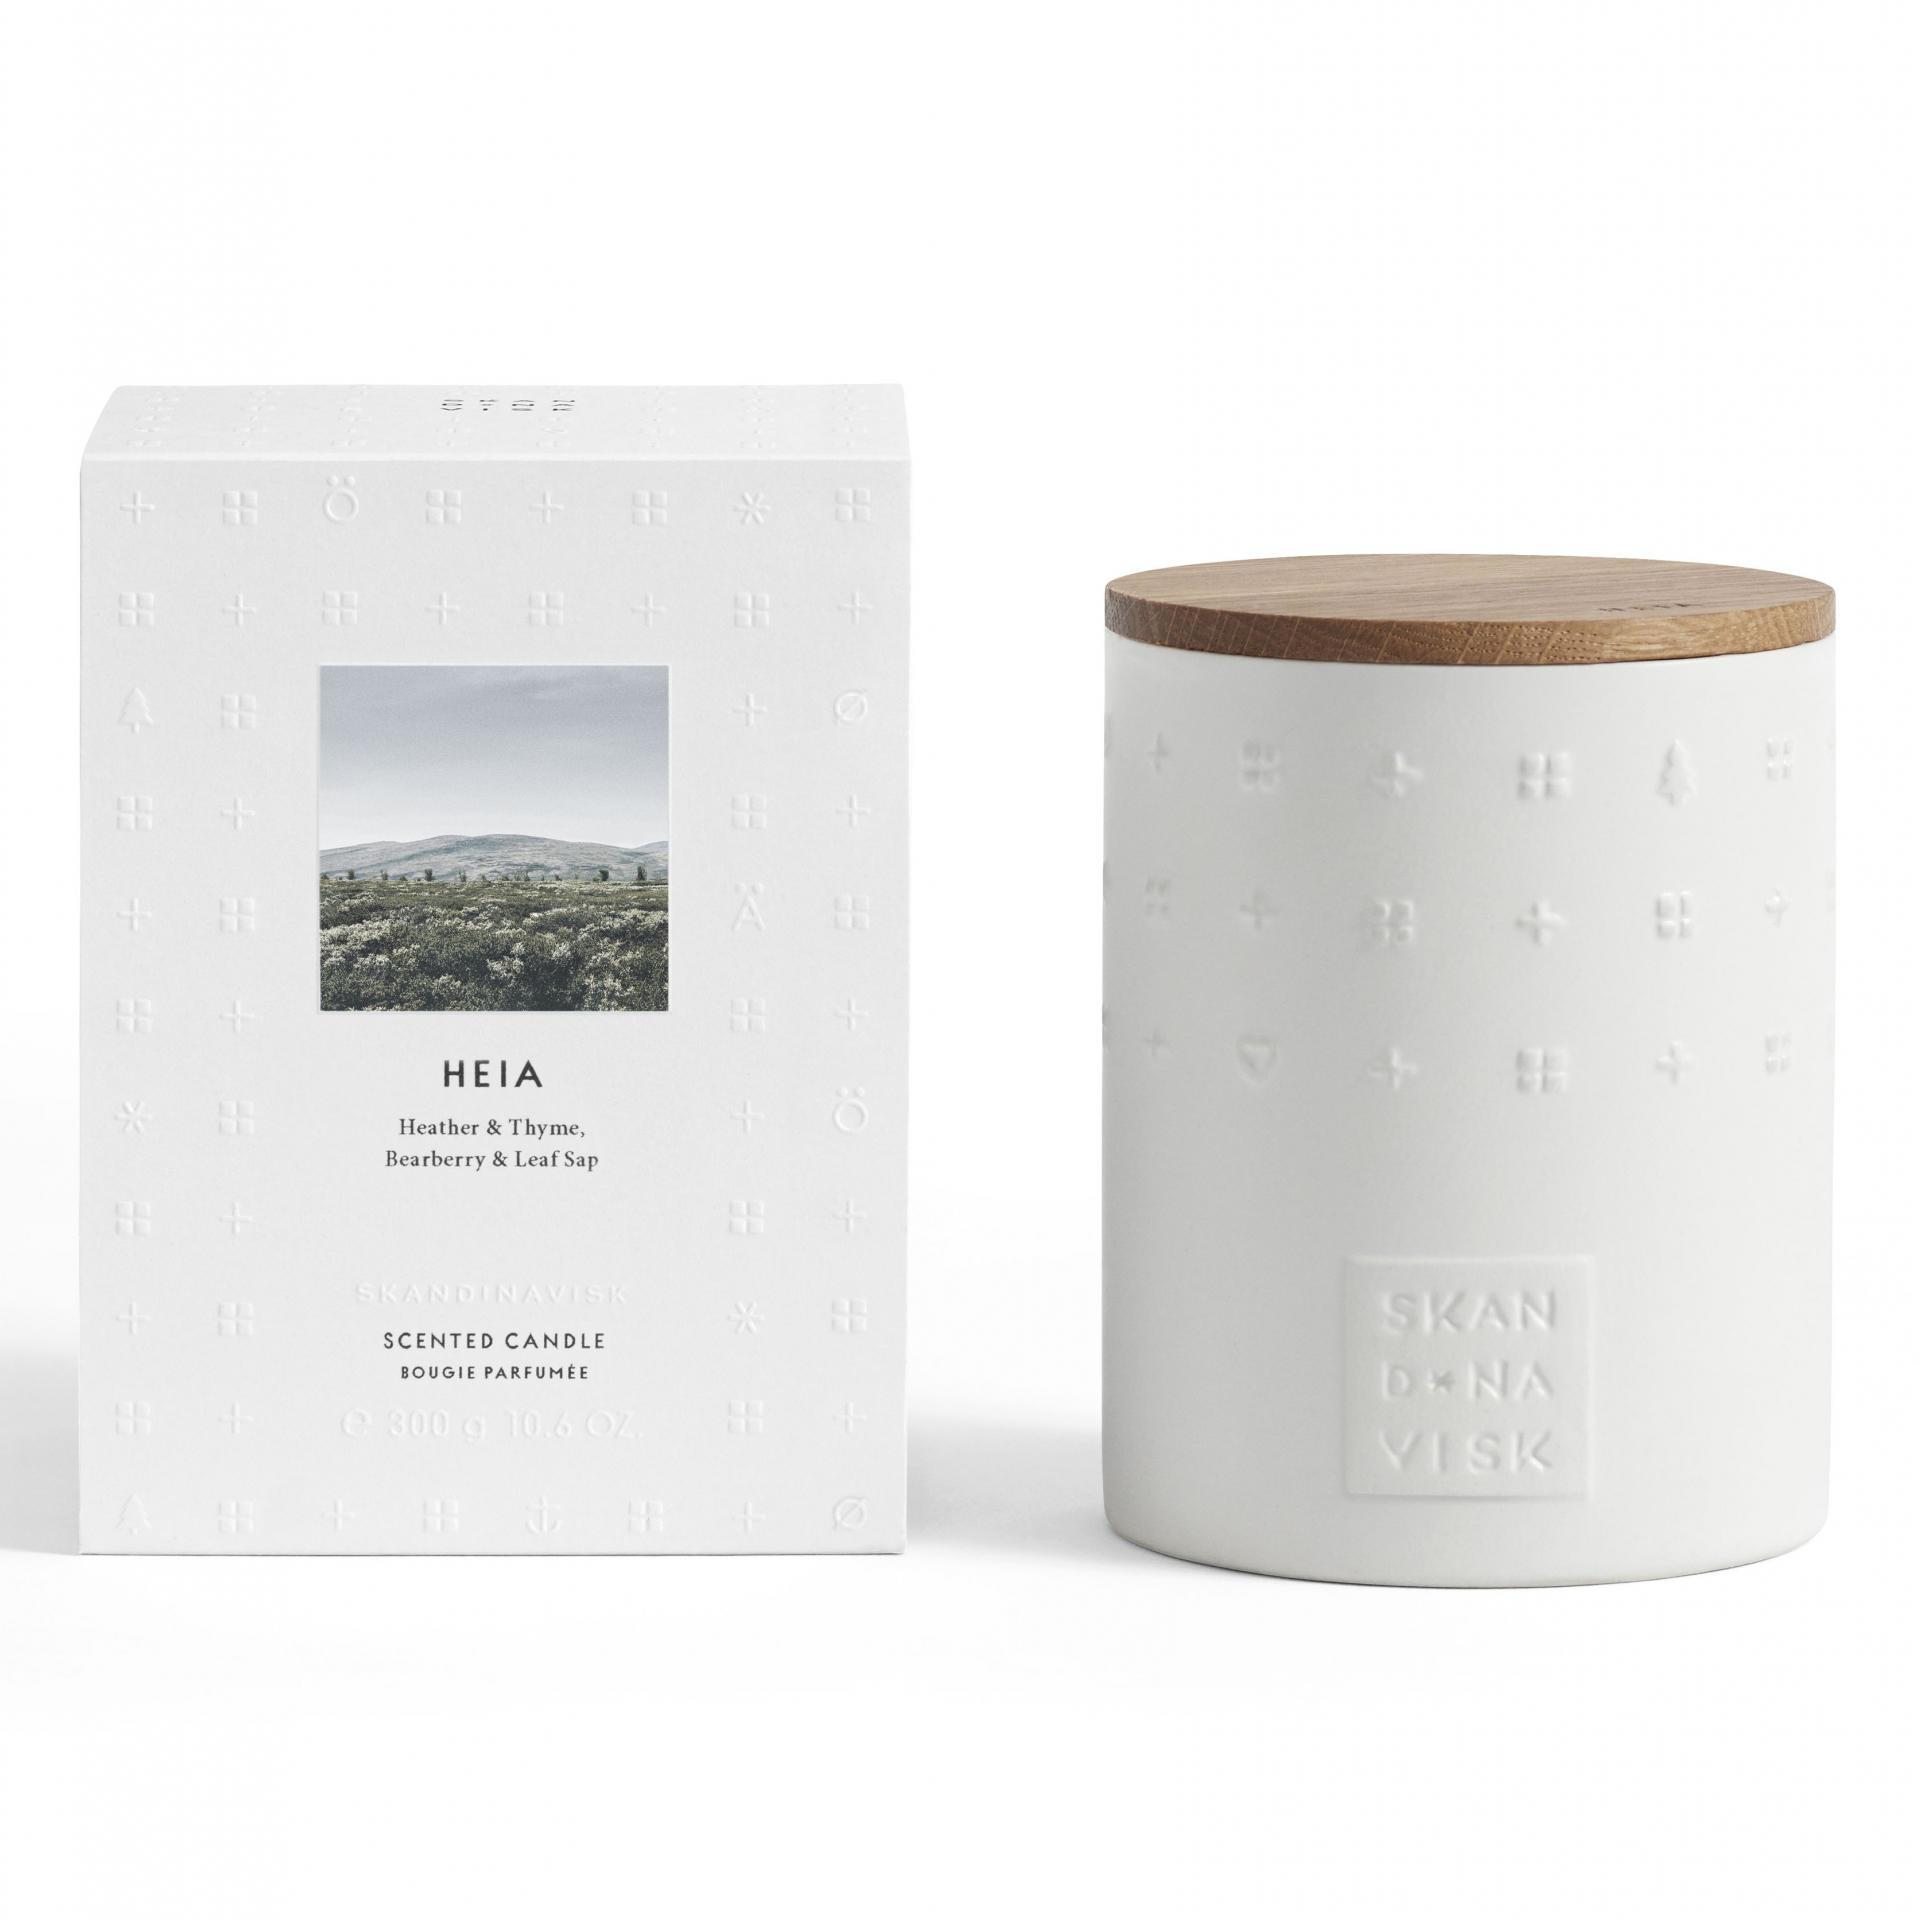 SKANDINAVISK Vonná svíčka HEIA (vřesoviště) 300 g, bílá barva, keramika